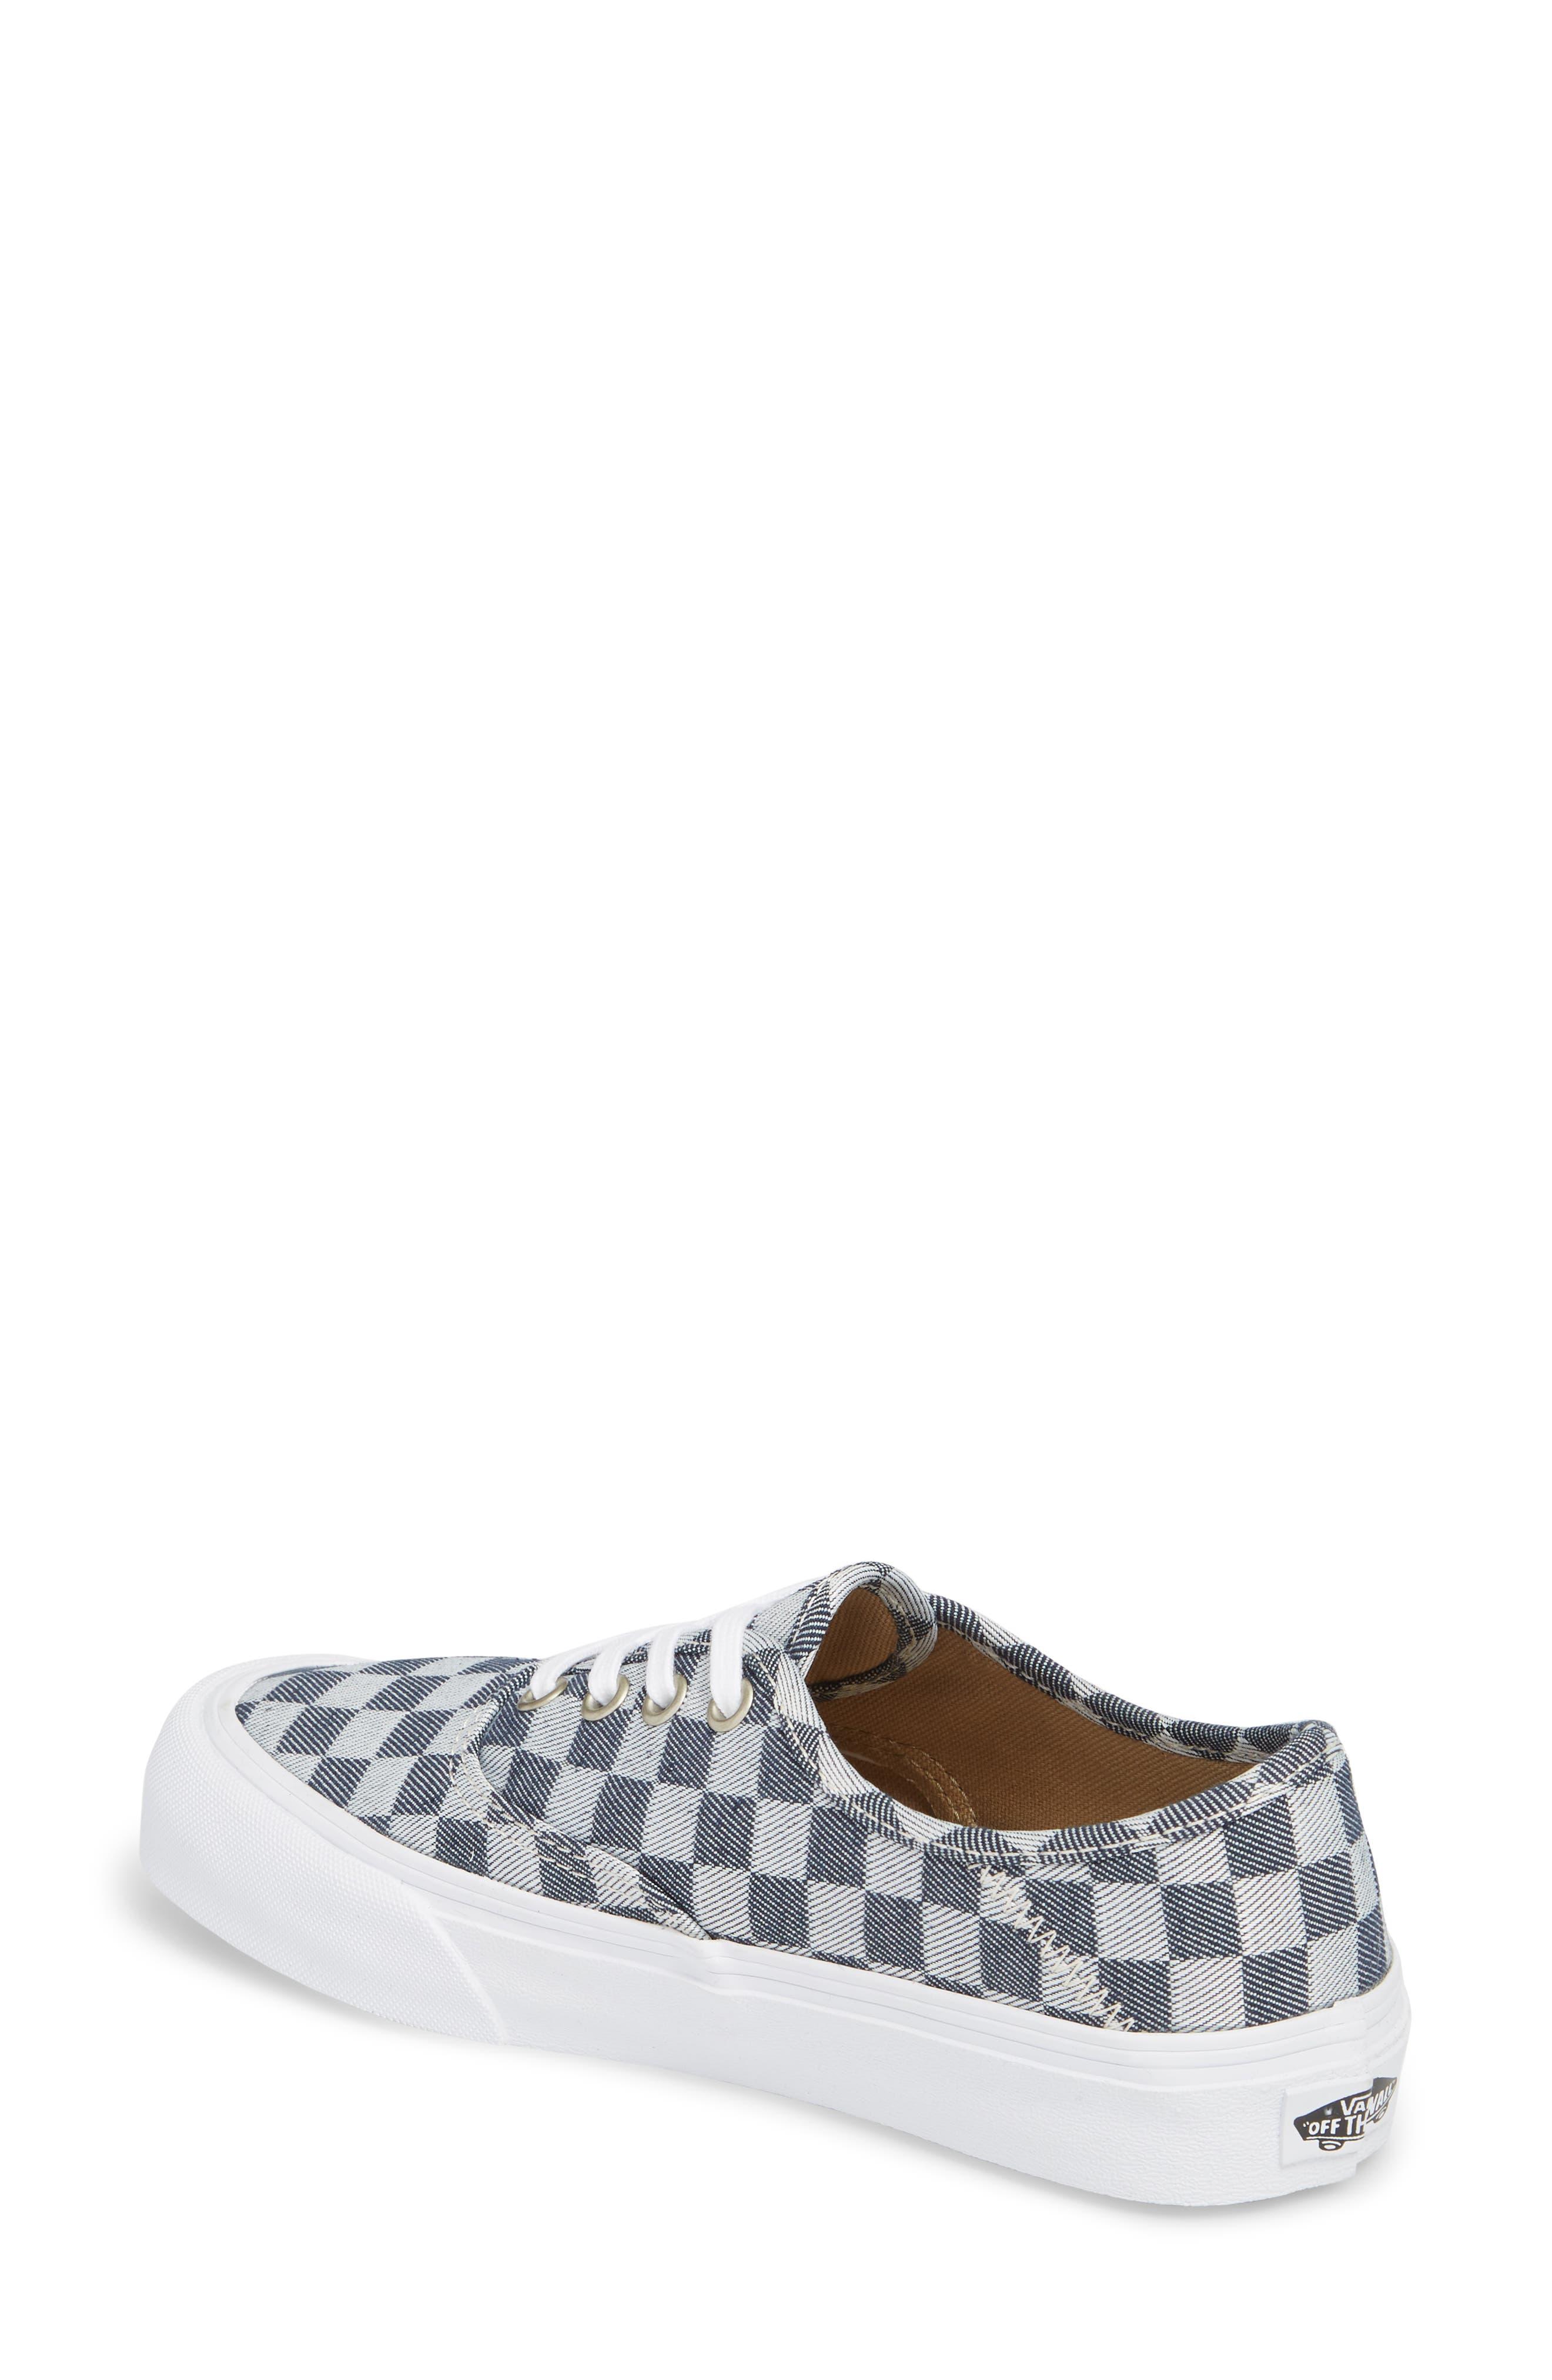 ,                             'Authentic' Sneaker,                             Alternate thumbnail 311, color,                             423